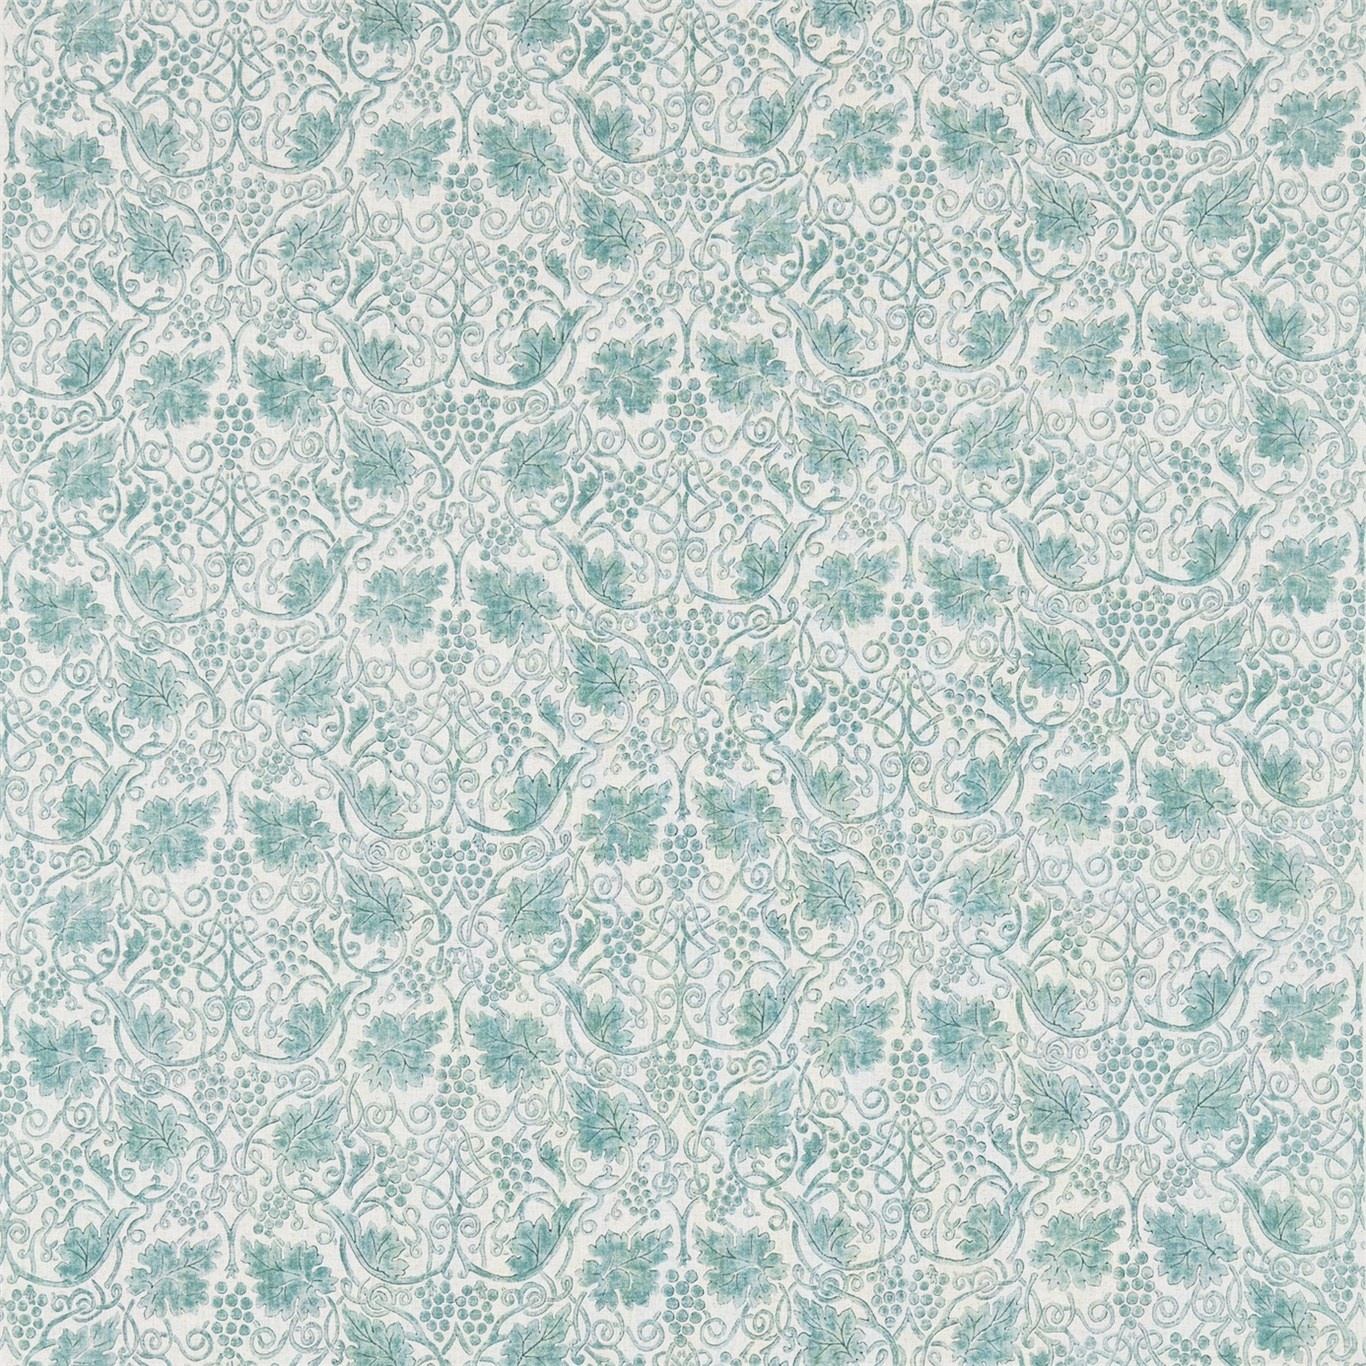 Image of Morris & Co Grapevine Sage Curtain Fabric 224474